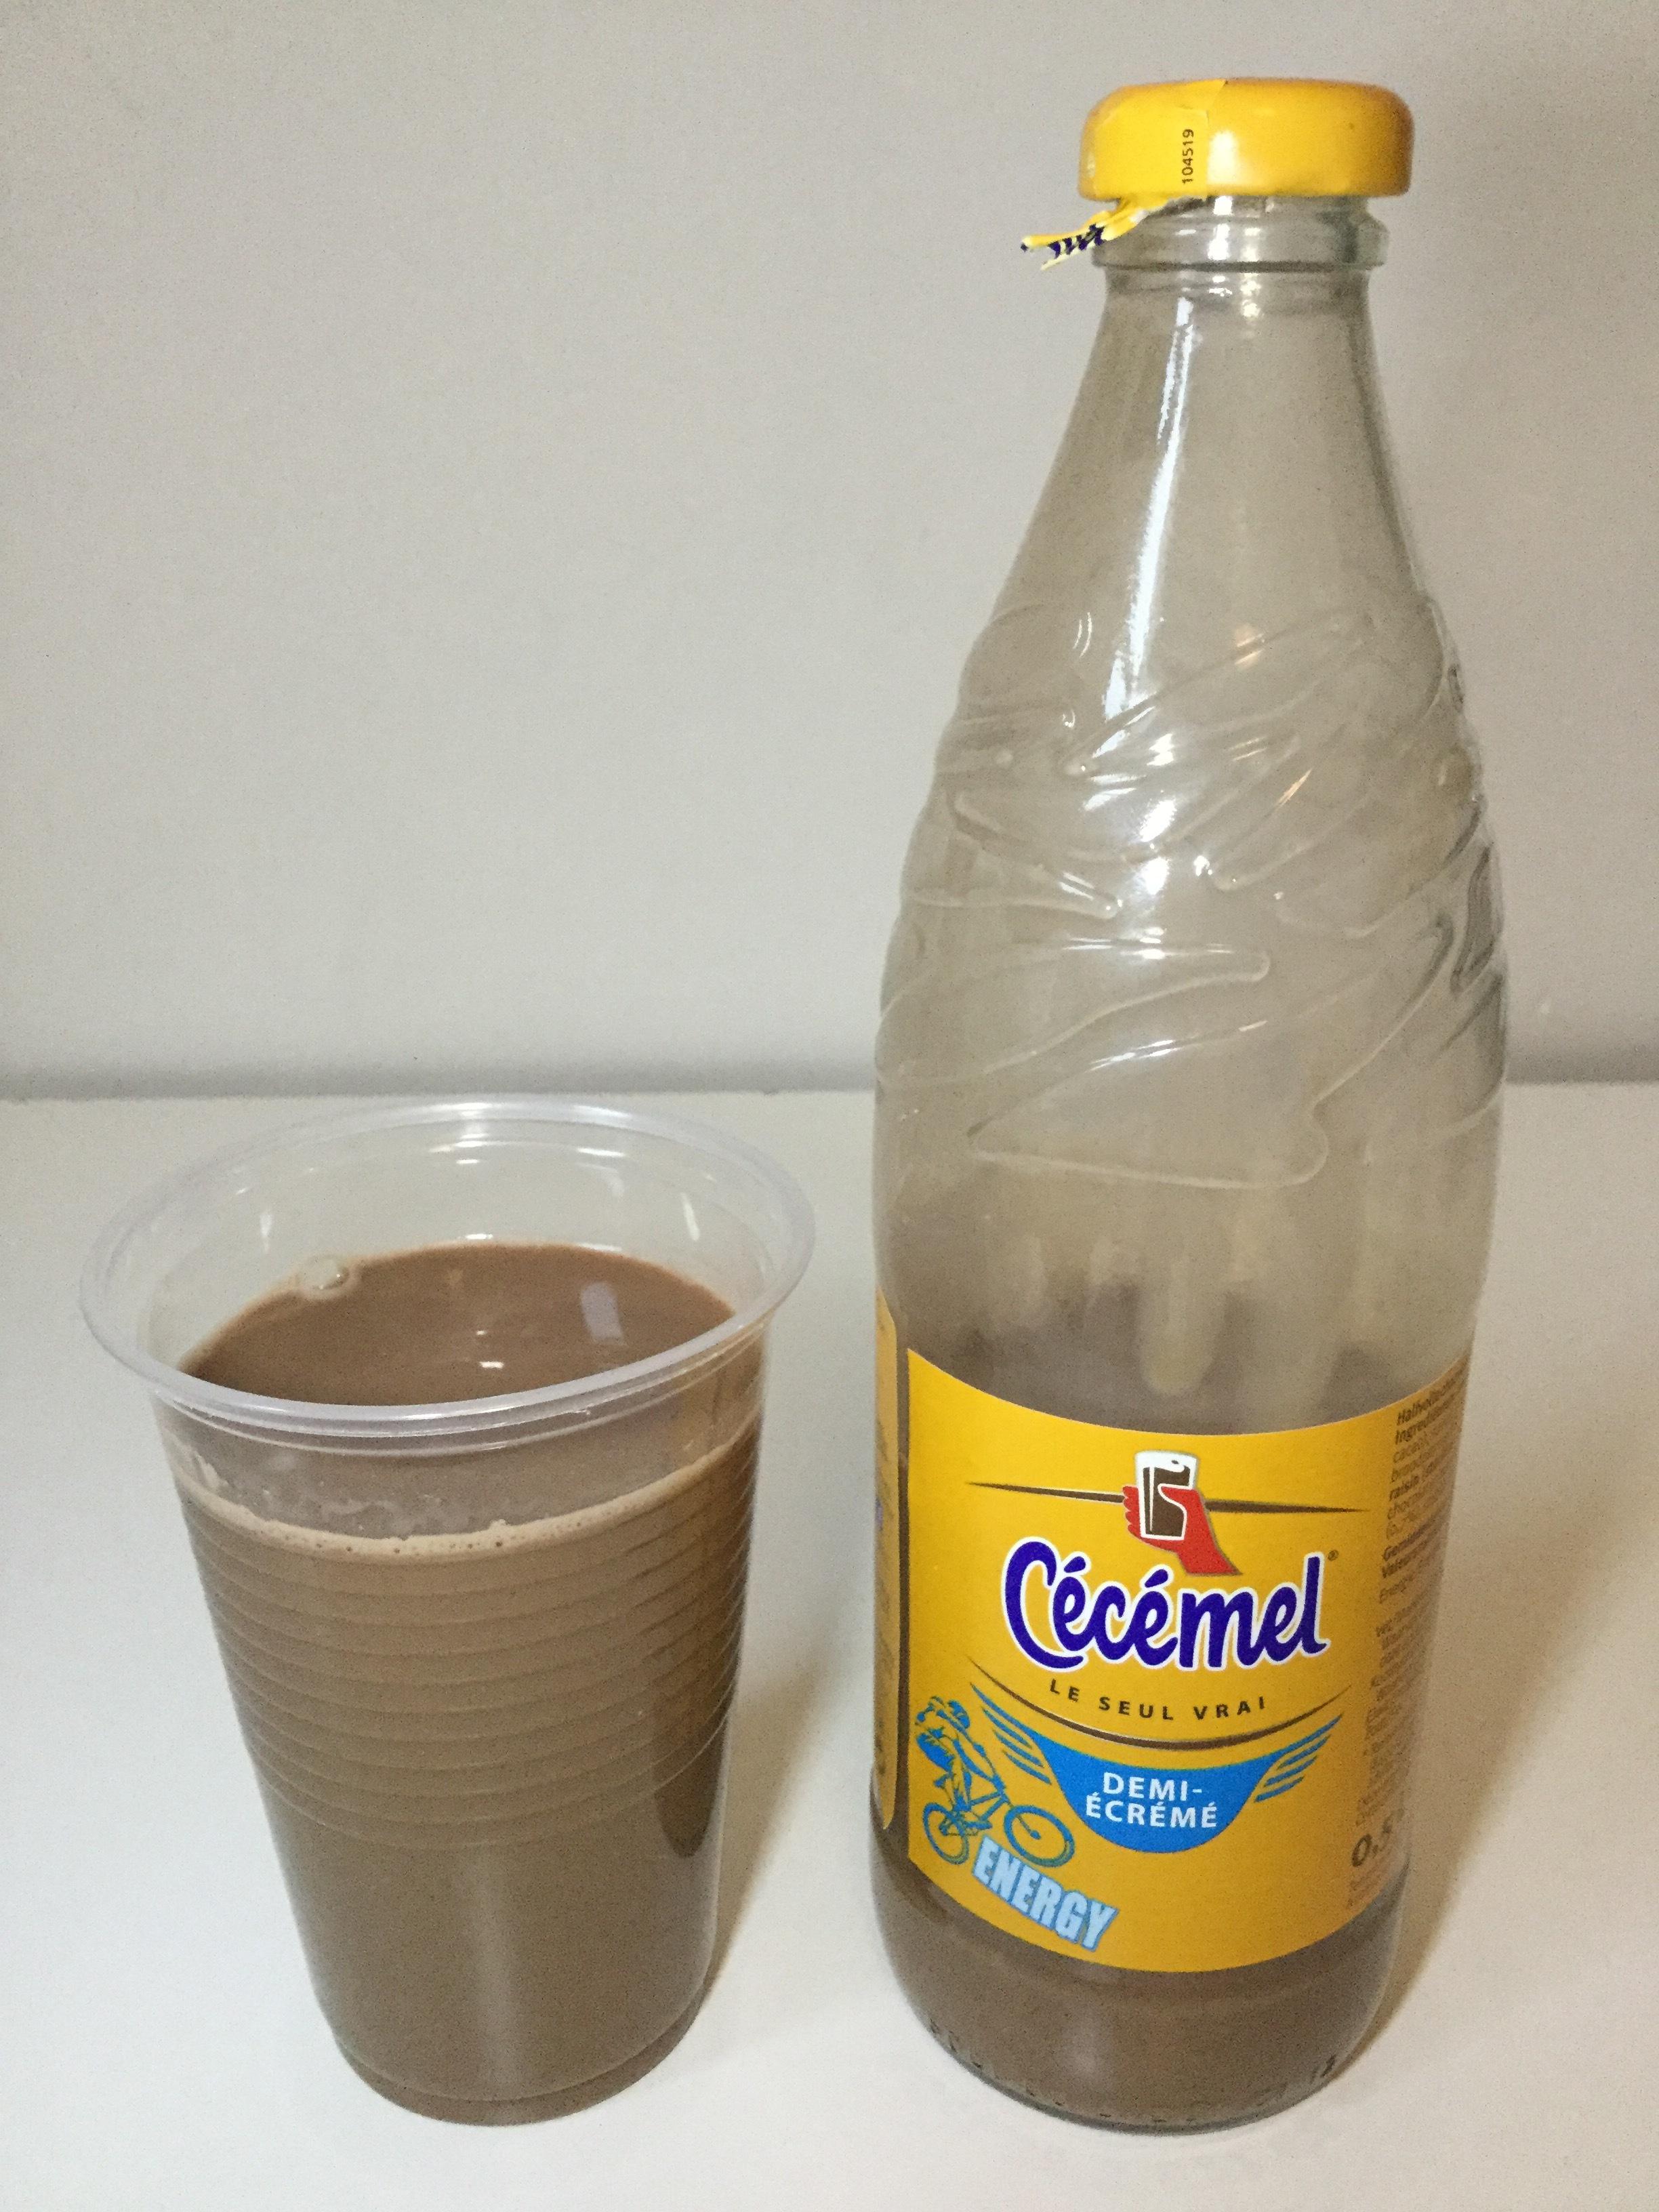 Cecemel Demi-Ecreme Cup